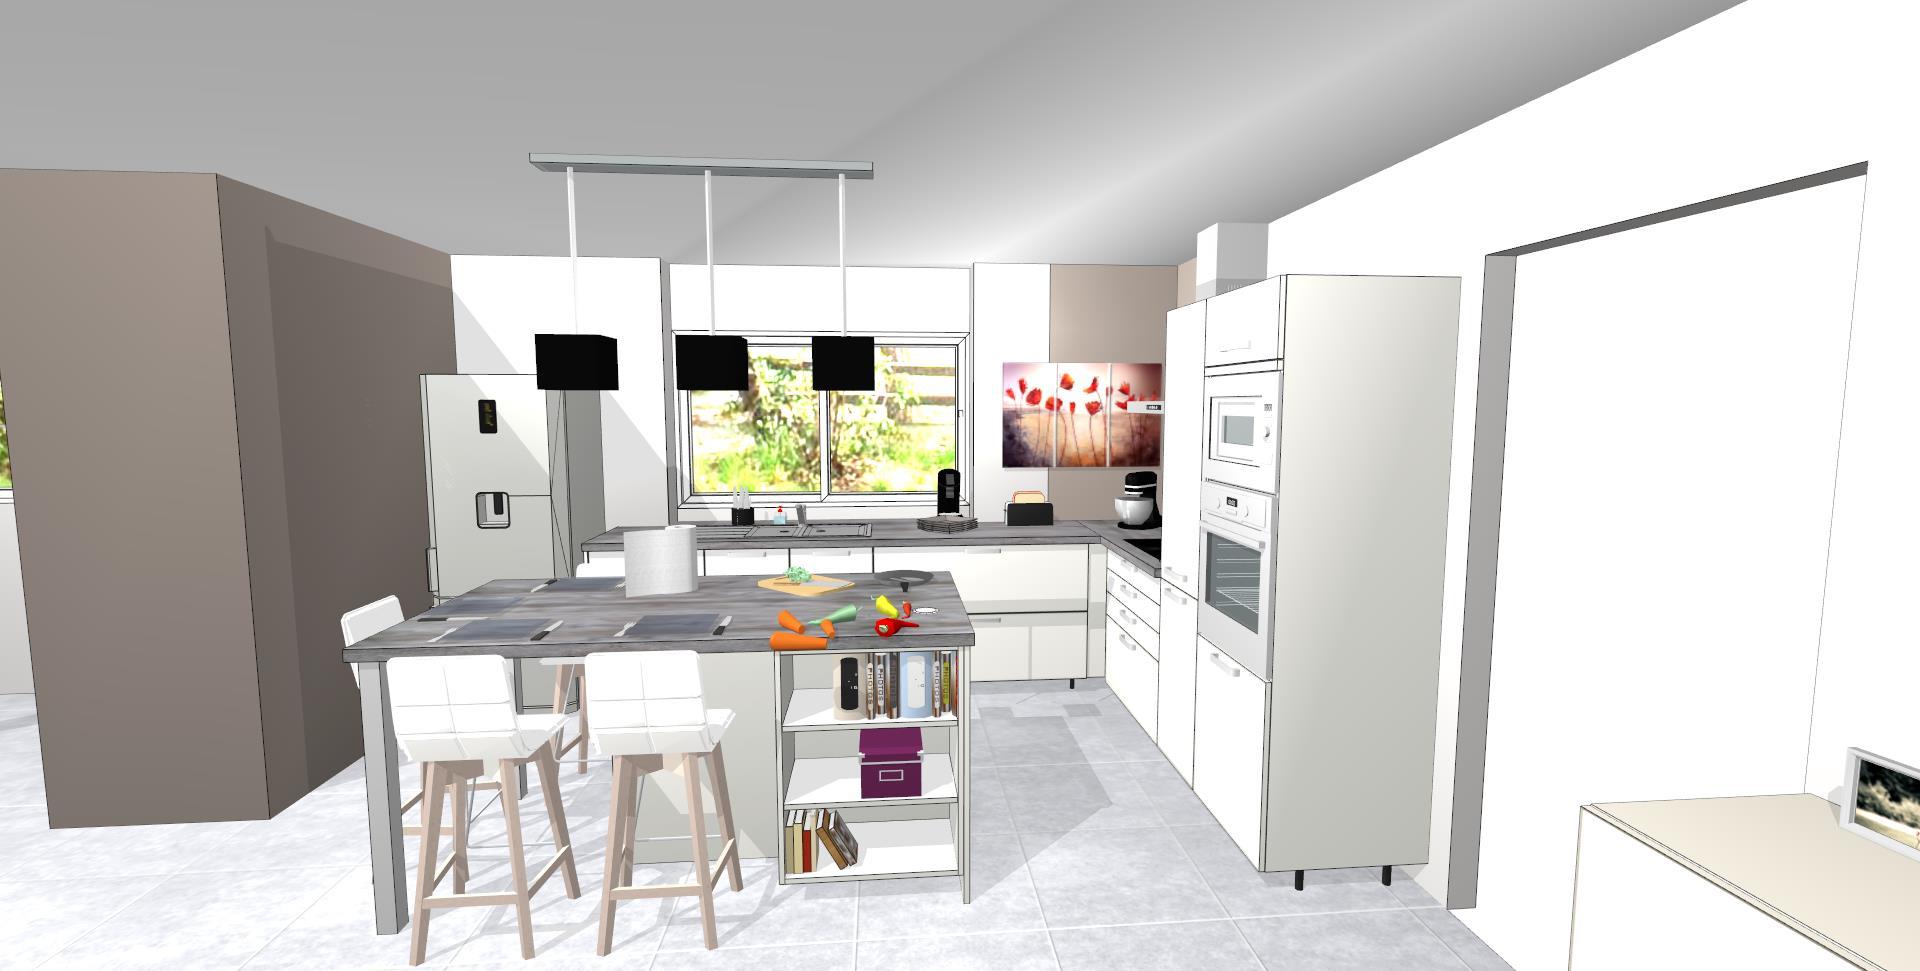 les projets implantation de vos cuisines 8902 messages page 477. Black Bedroom Furniture Sets. Home Design Ideas